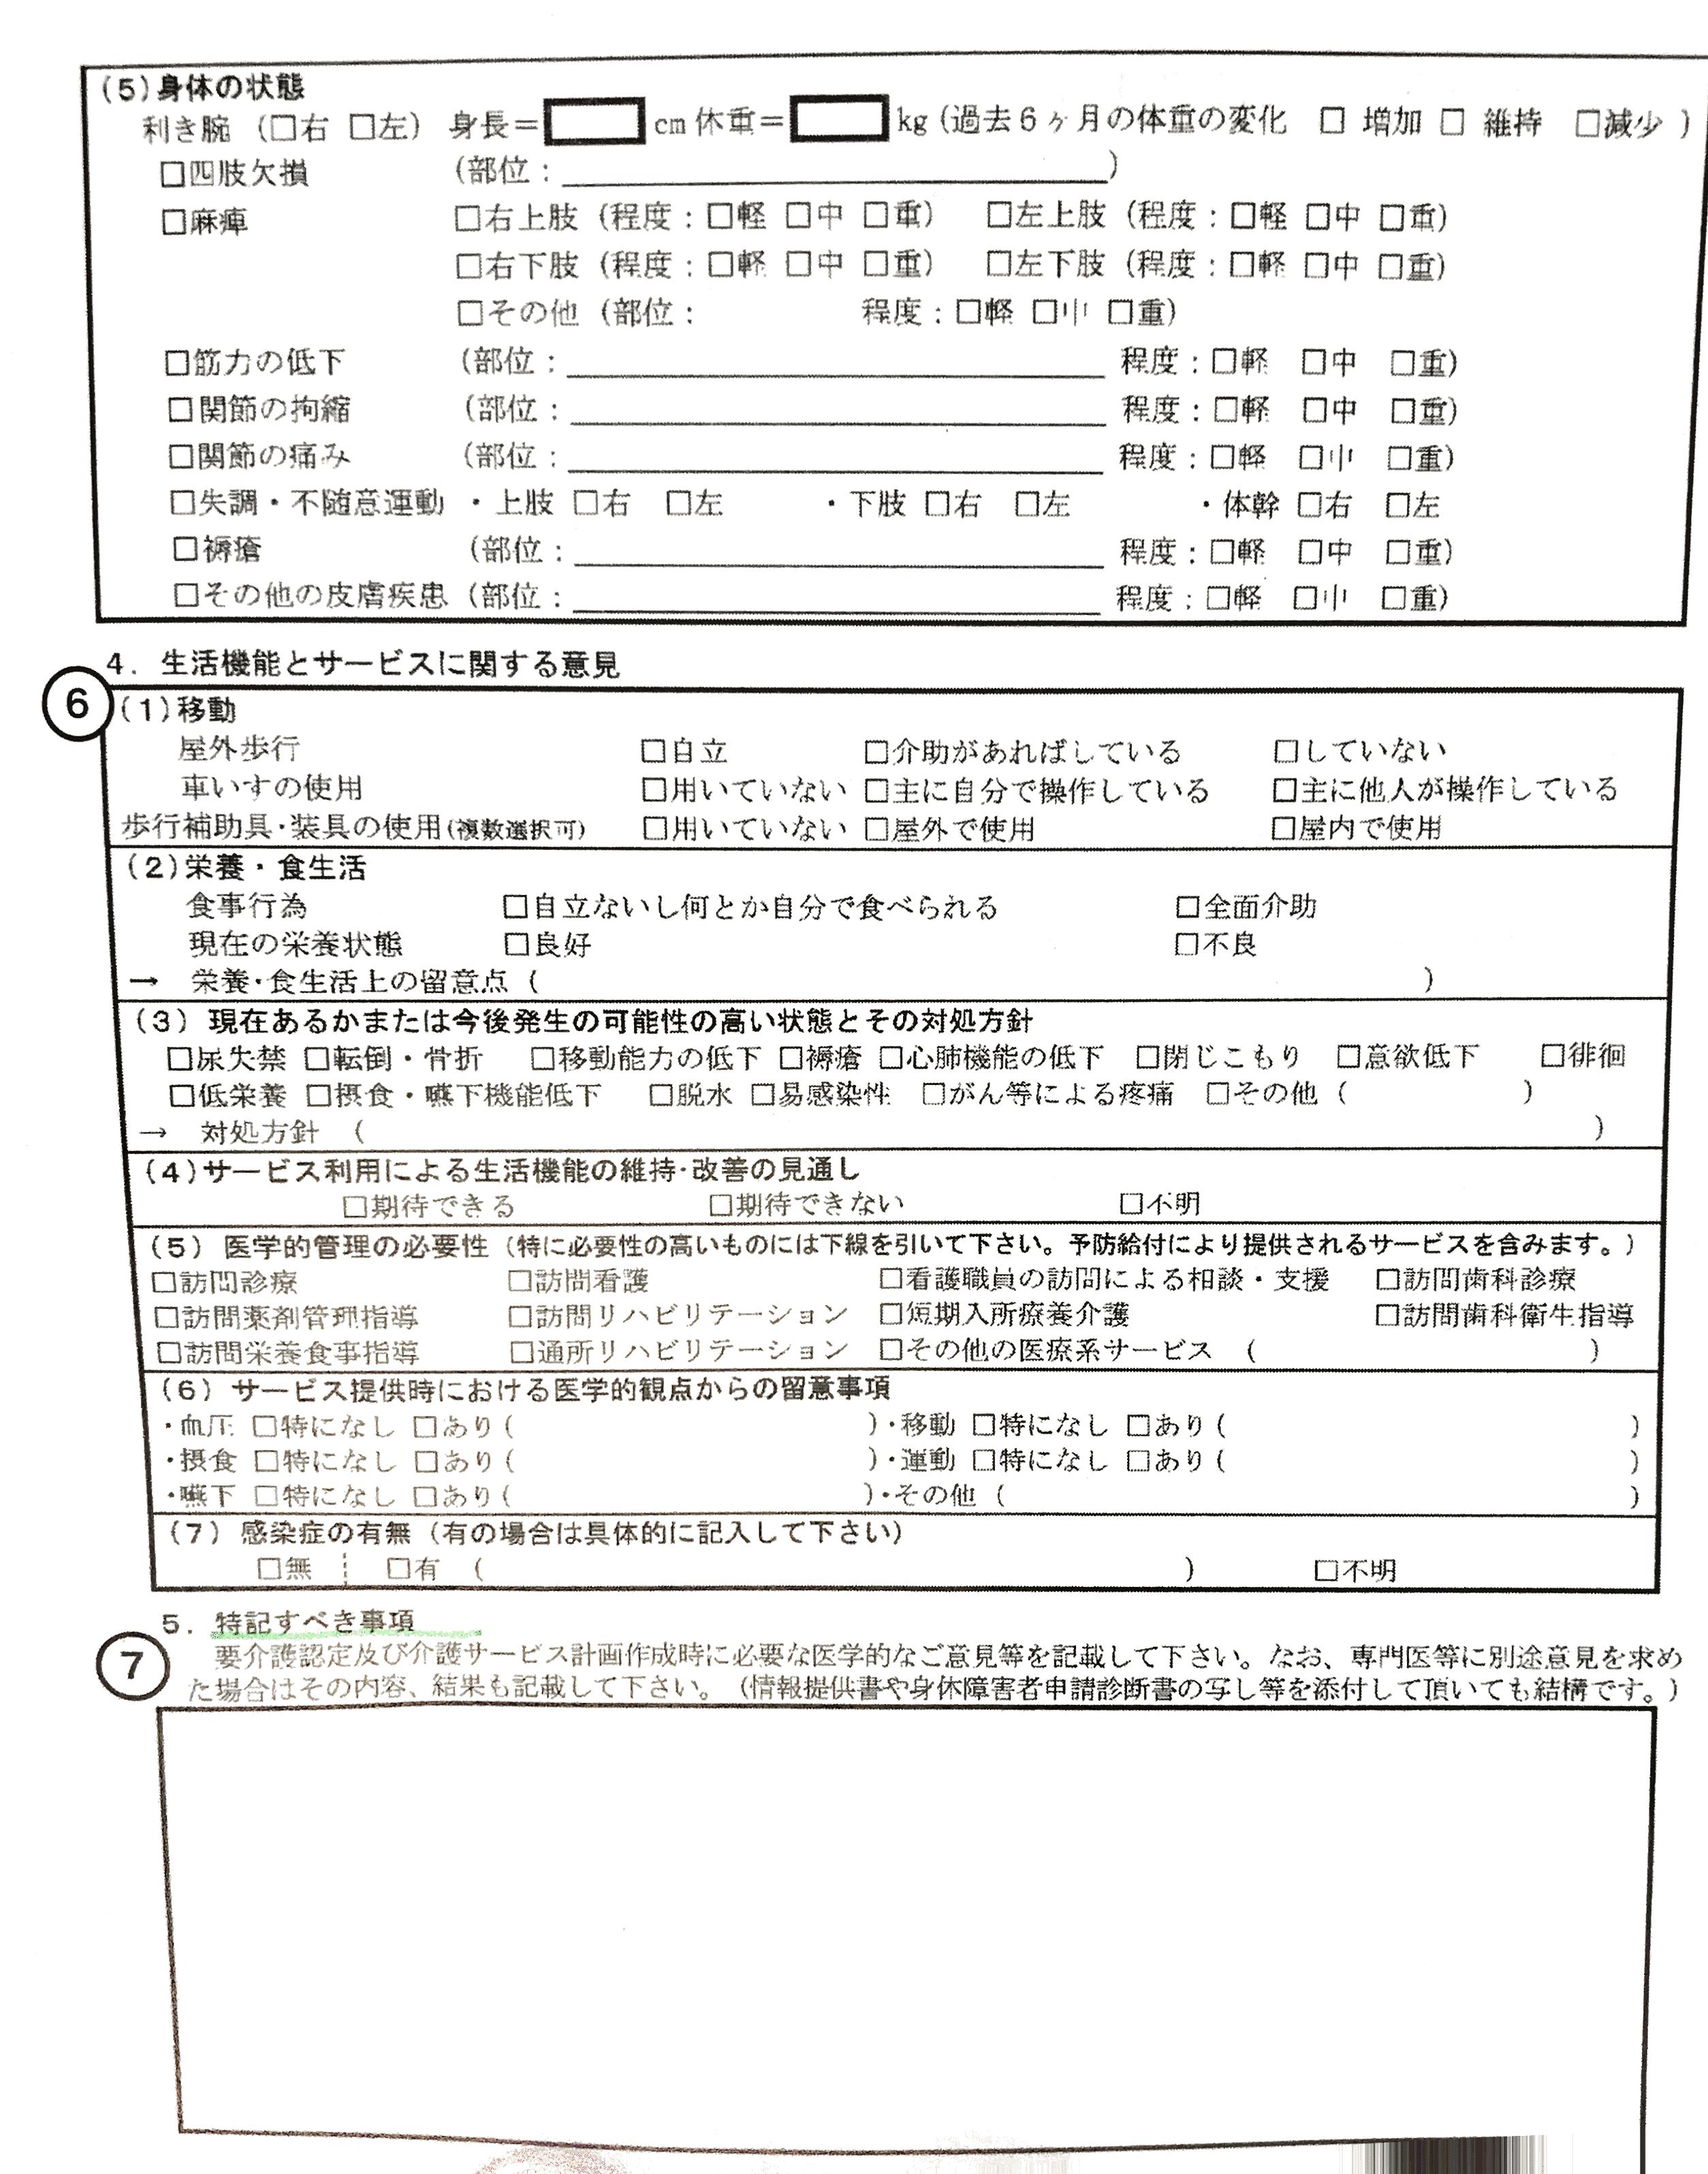 395b196653a8acde407b.png